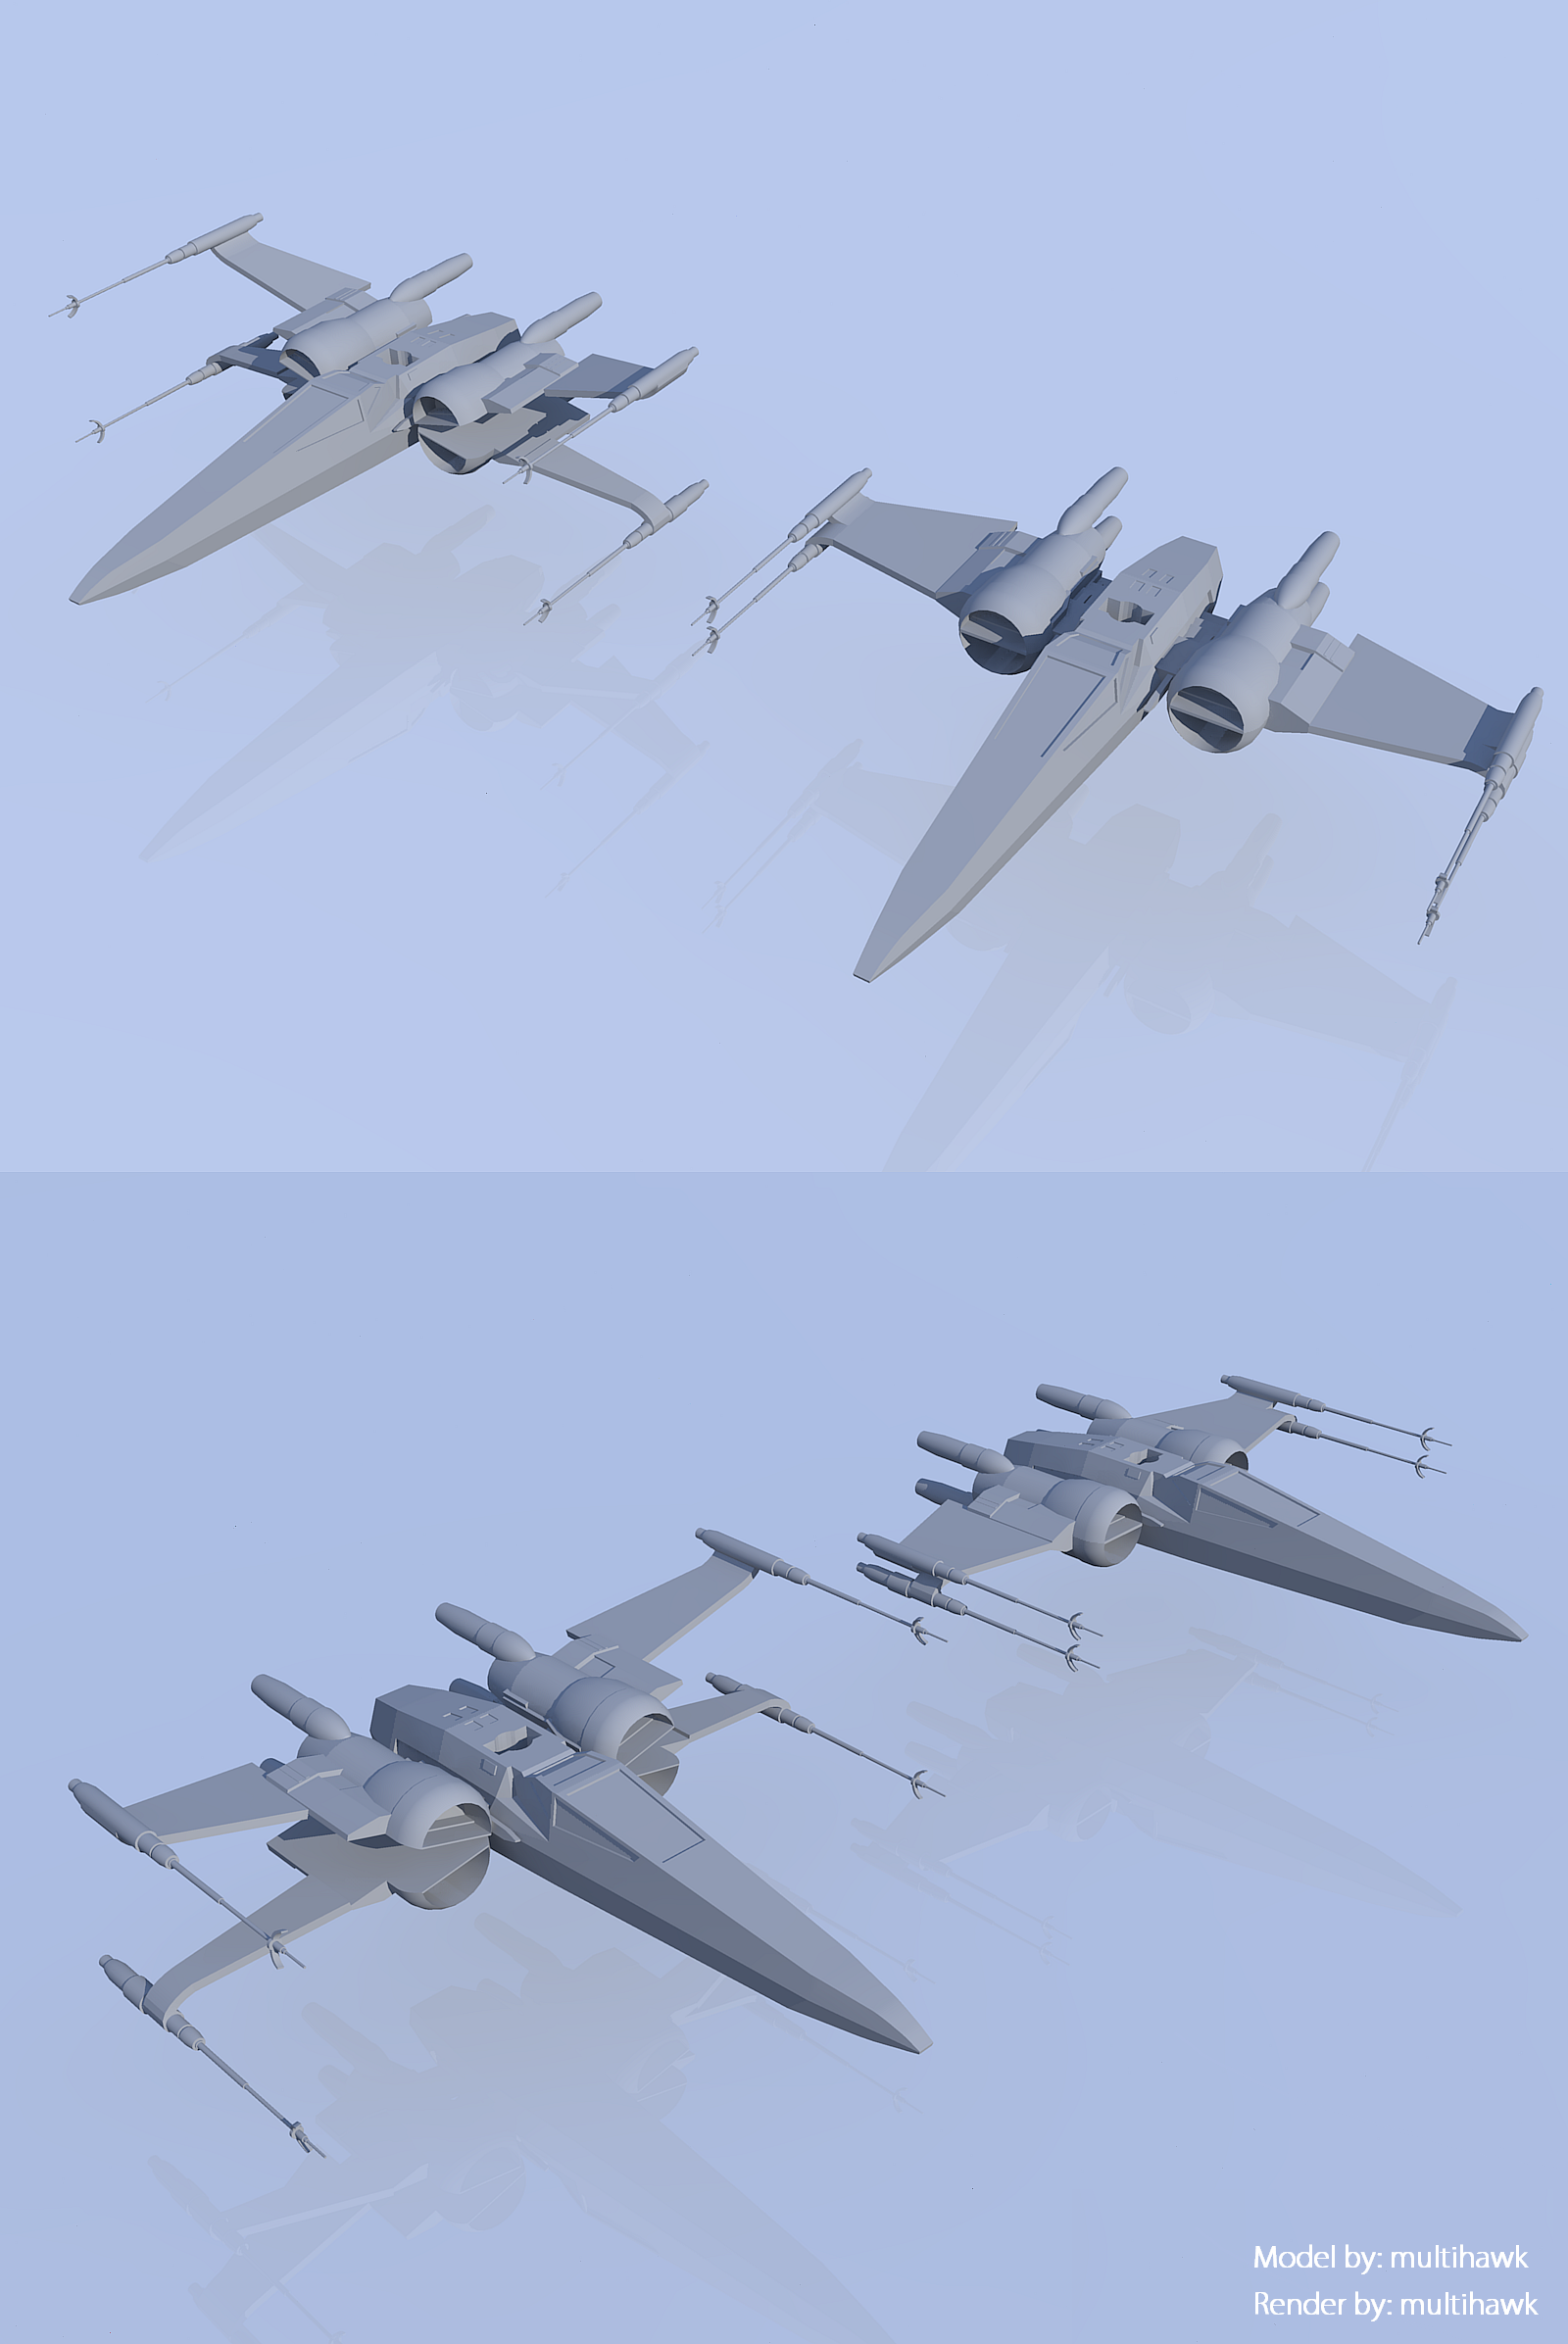 Star Wars The Force Awakens X-wing by multihawk on DeviantArt